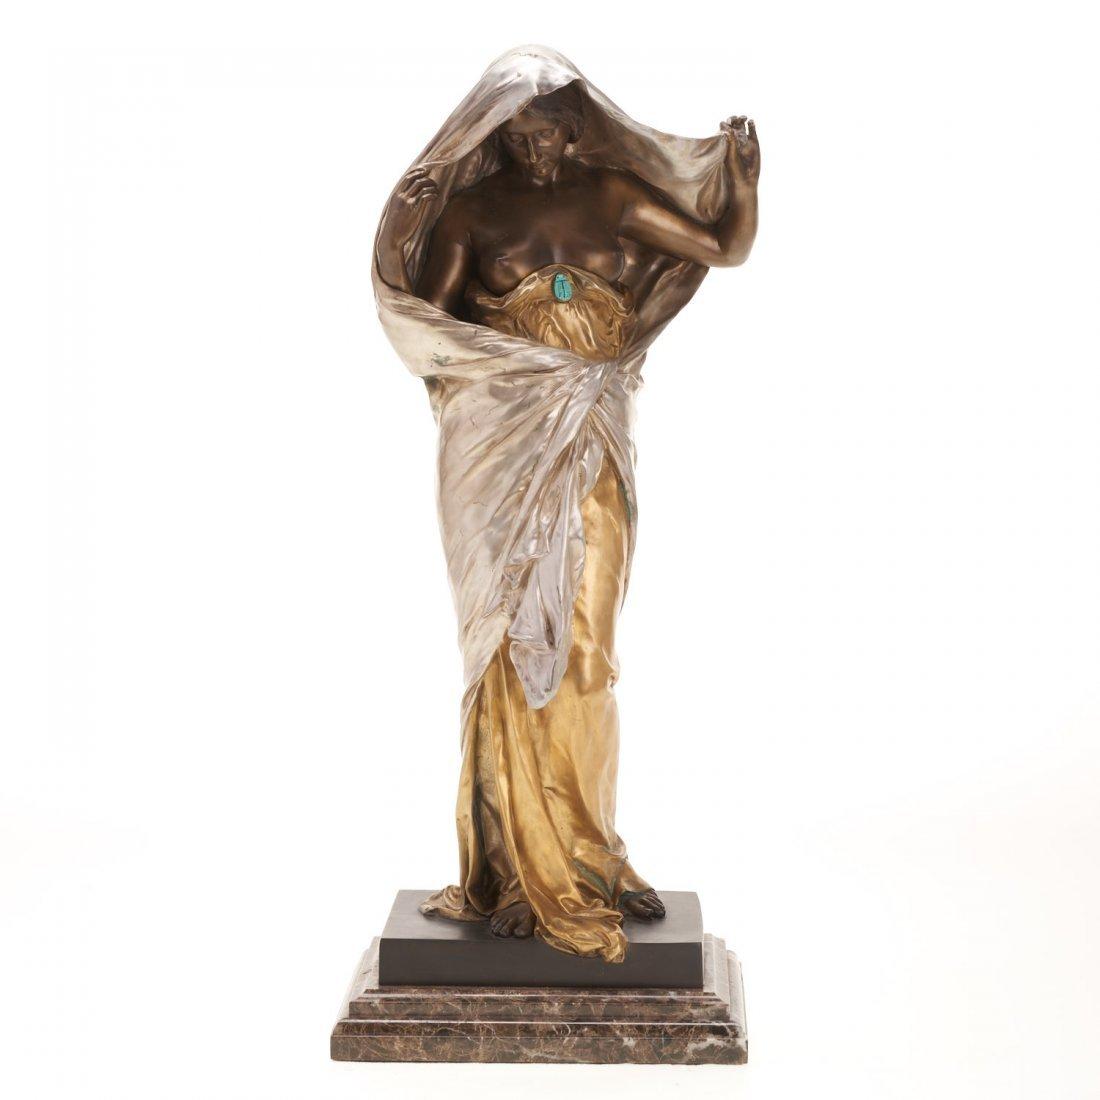 Louis-Ernest Barrias, bronze sculpture